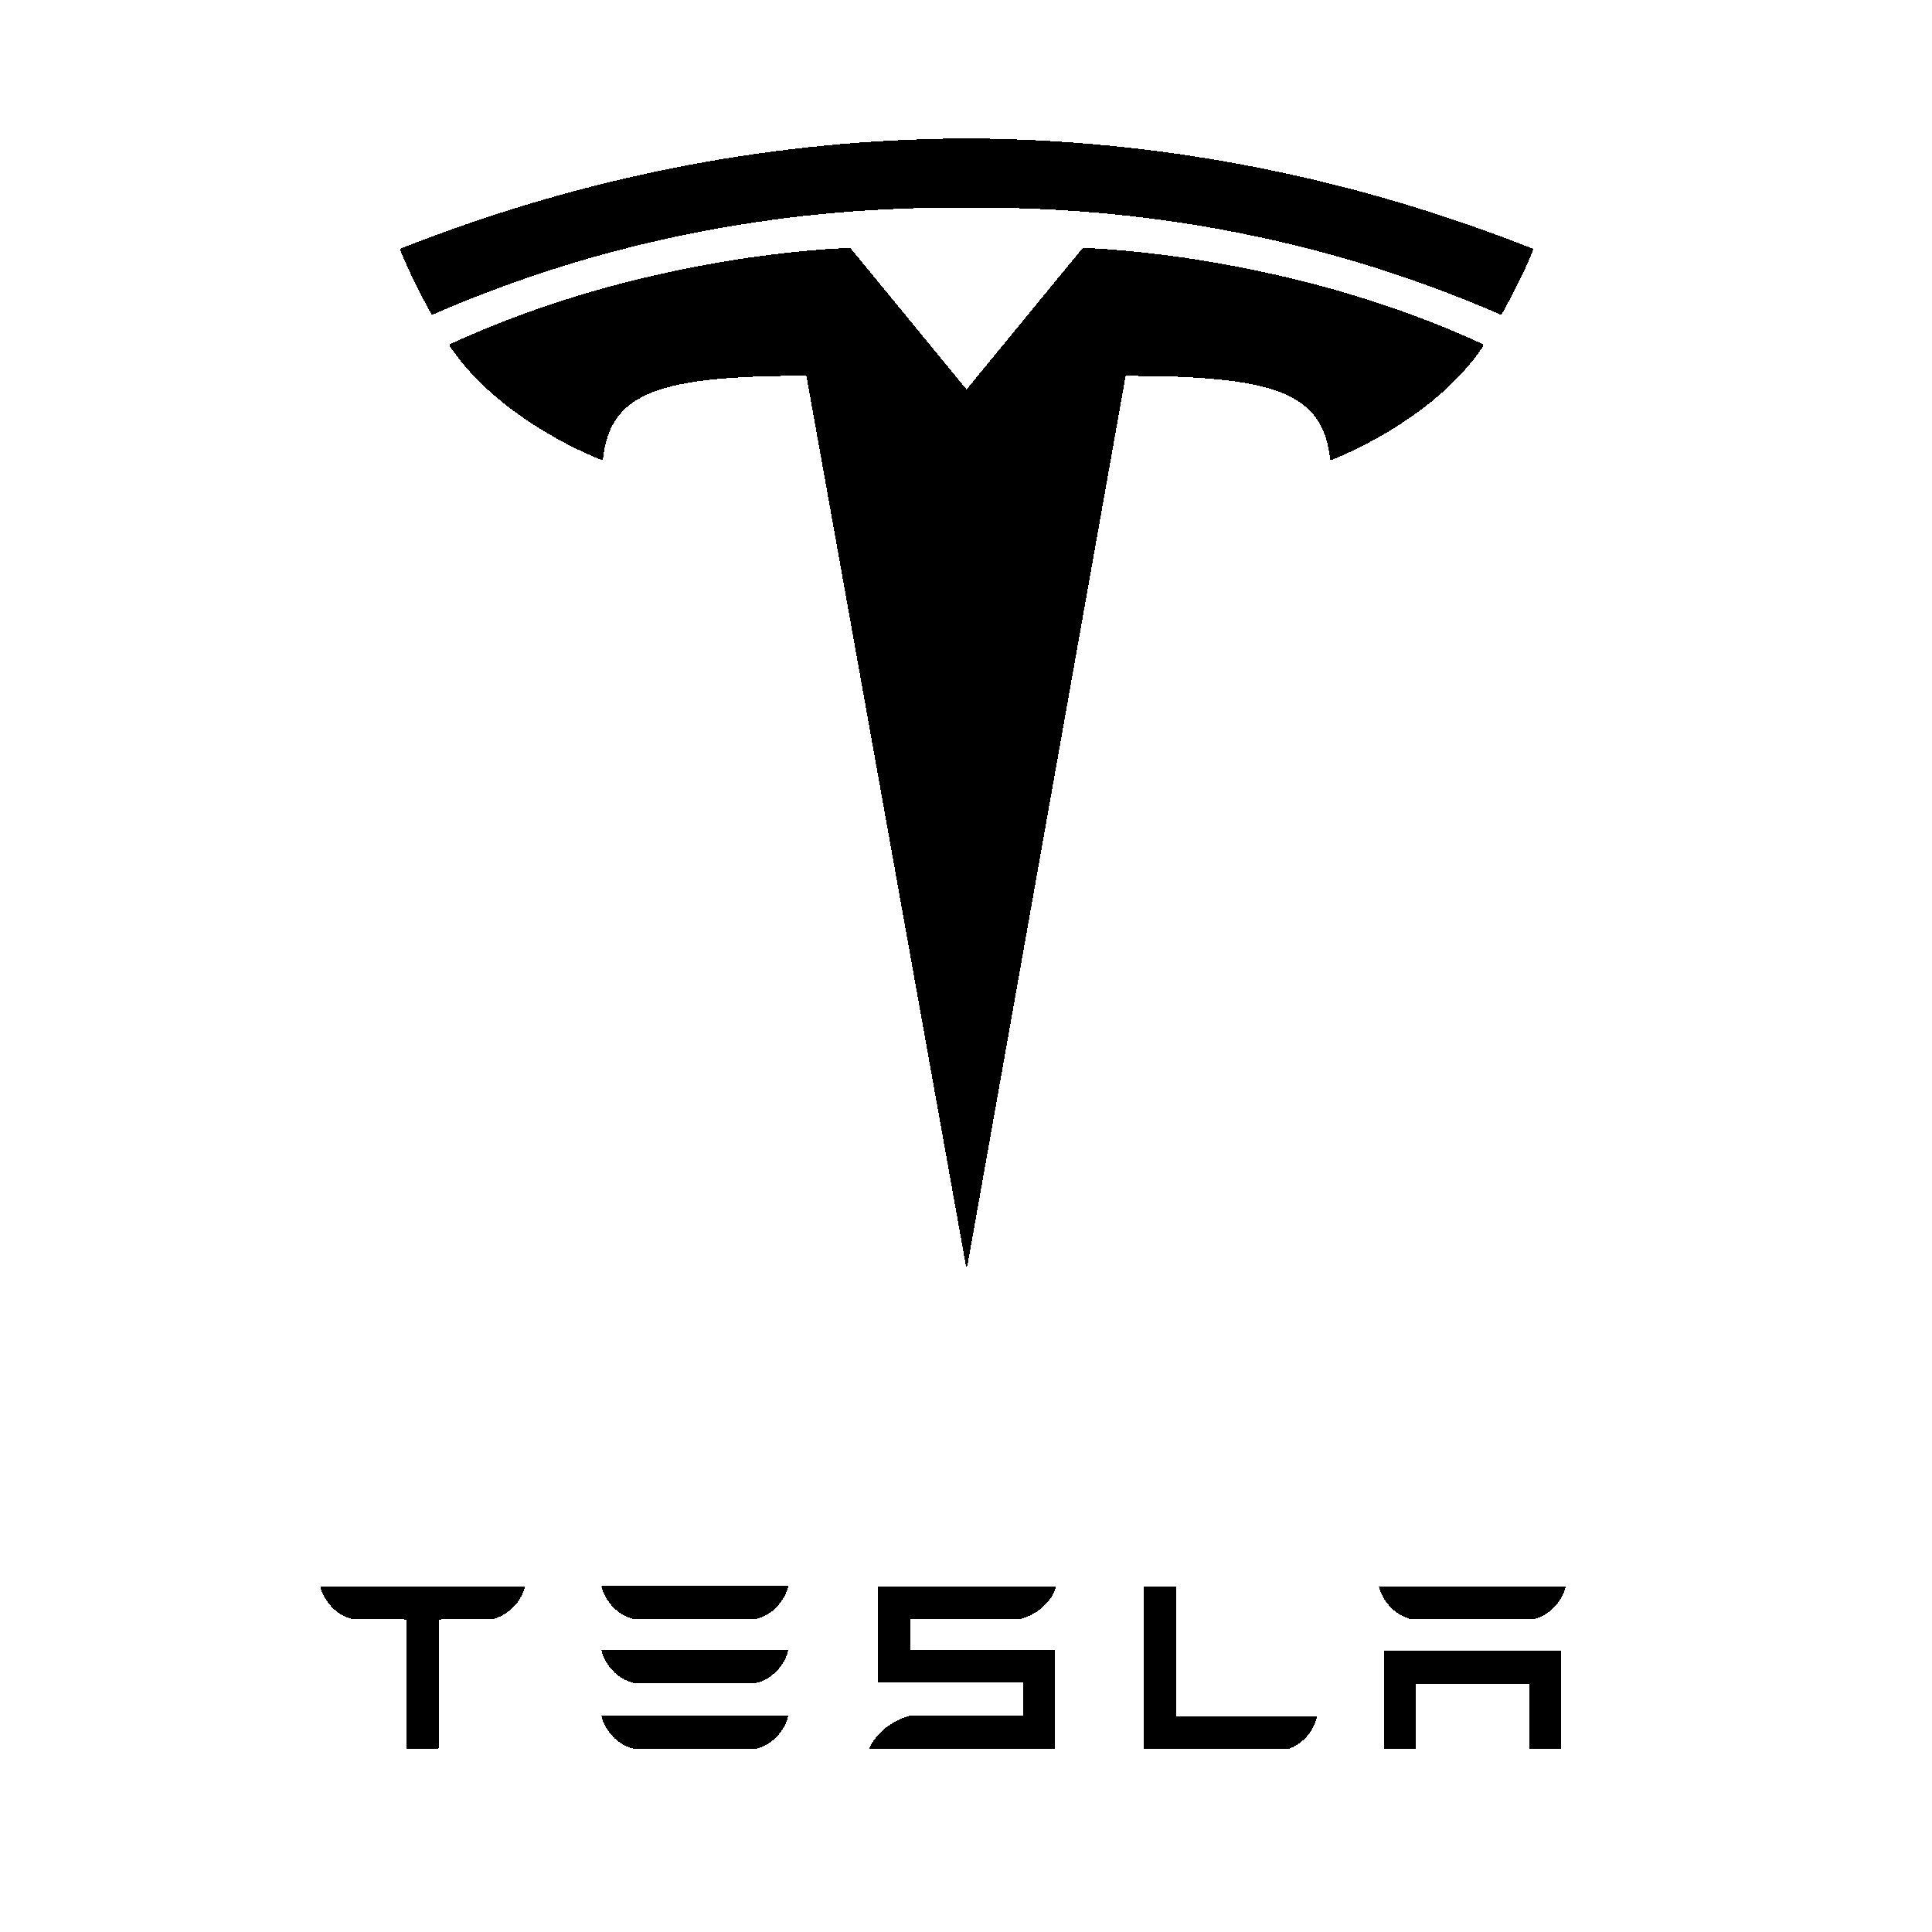 2 Foot Tesla Motors Logo Vinyl Decal Repositionable Sticker - Choose Your Color (Black)